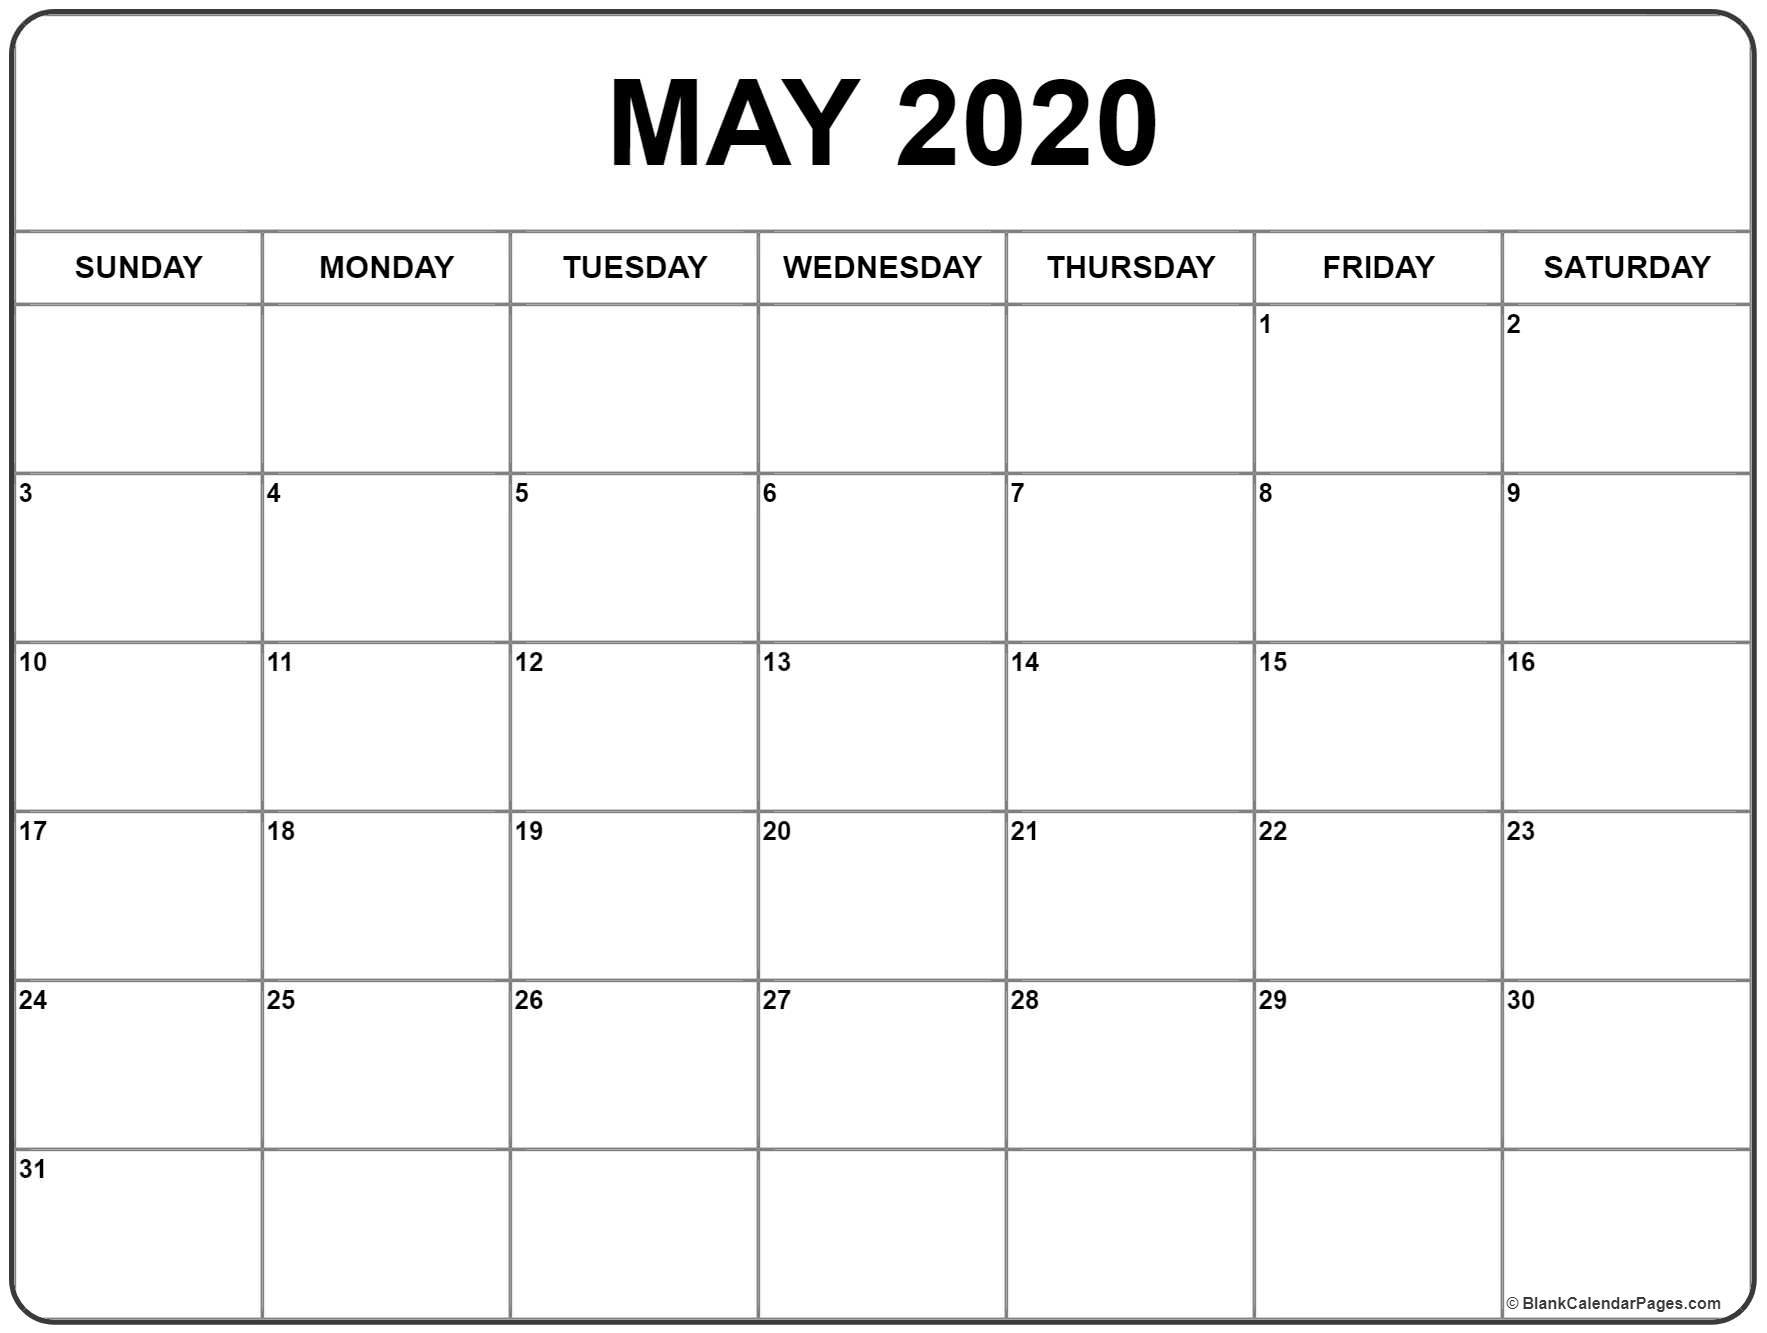 May 2020 Calendar | Free Printable Monthly Calendars